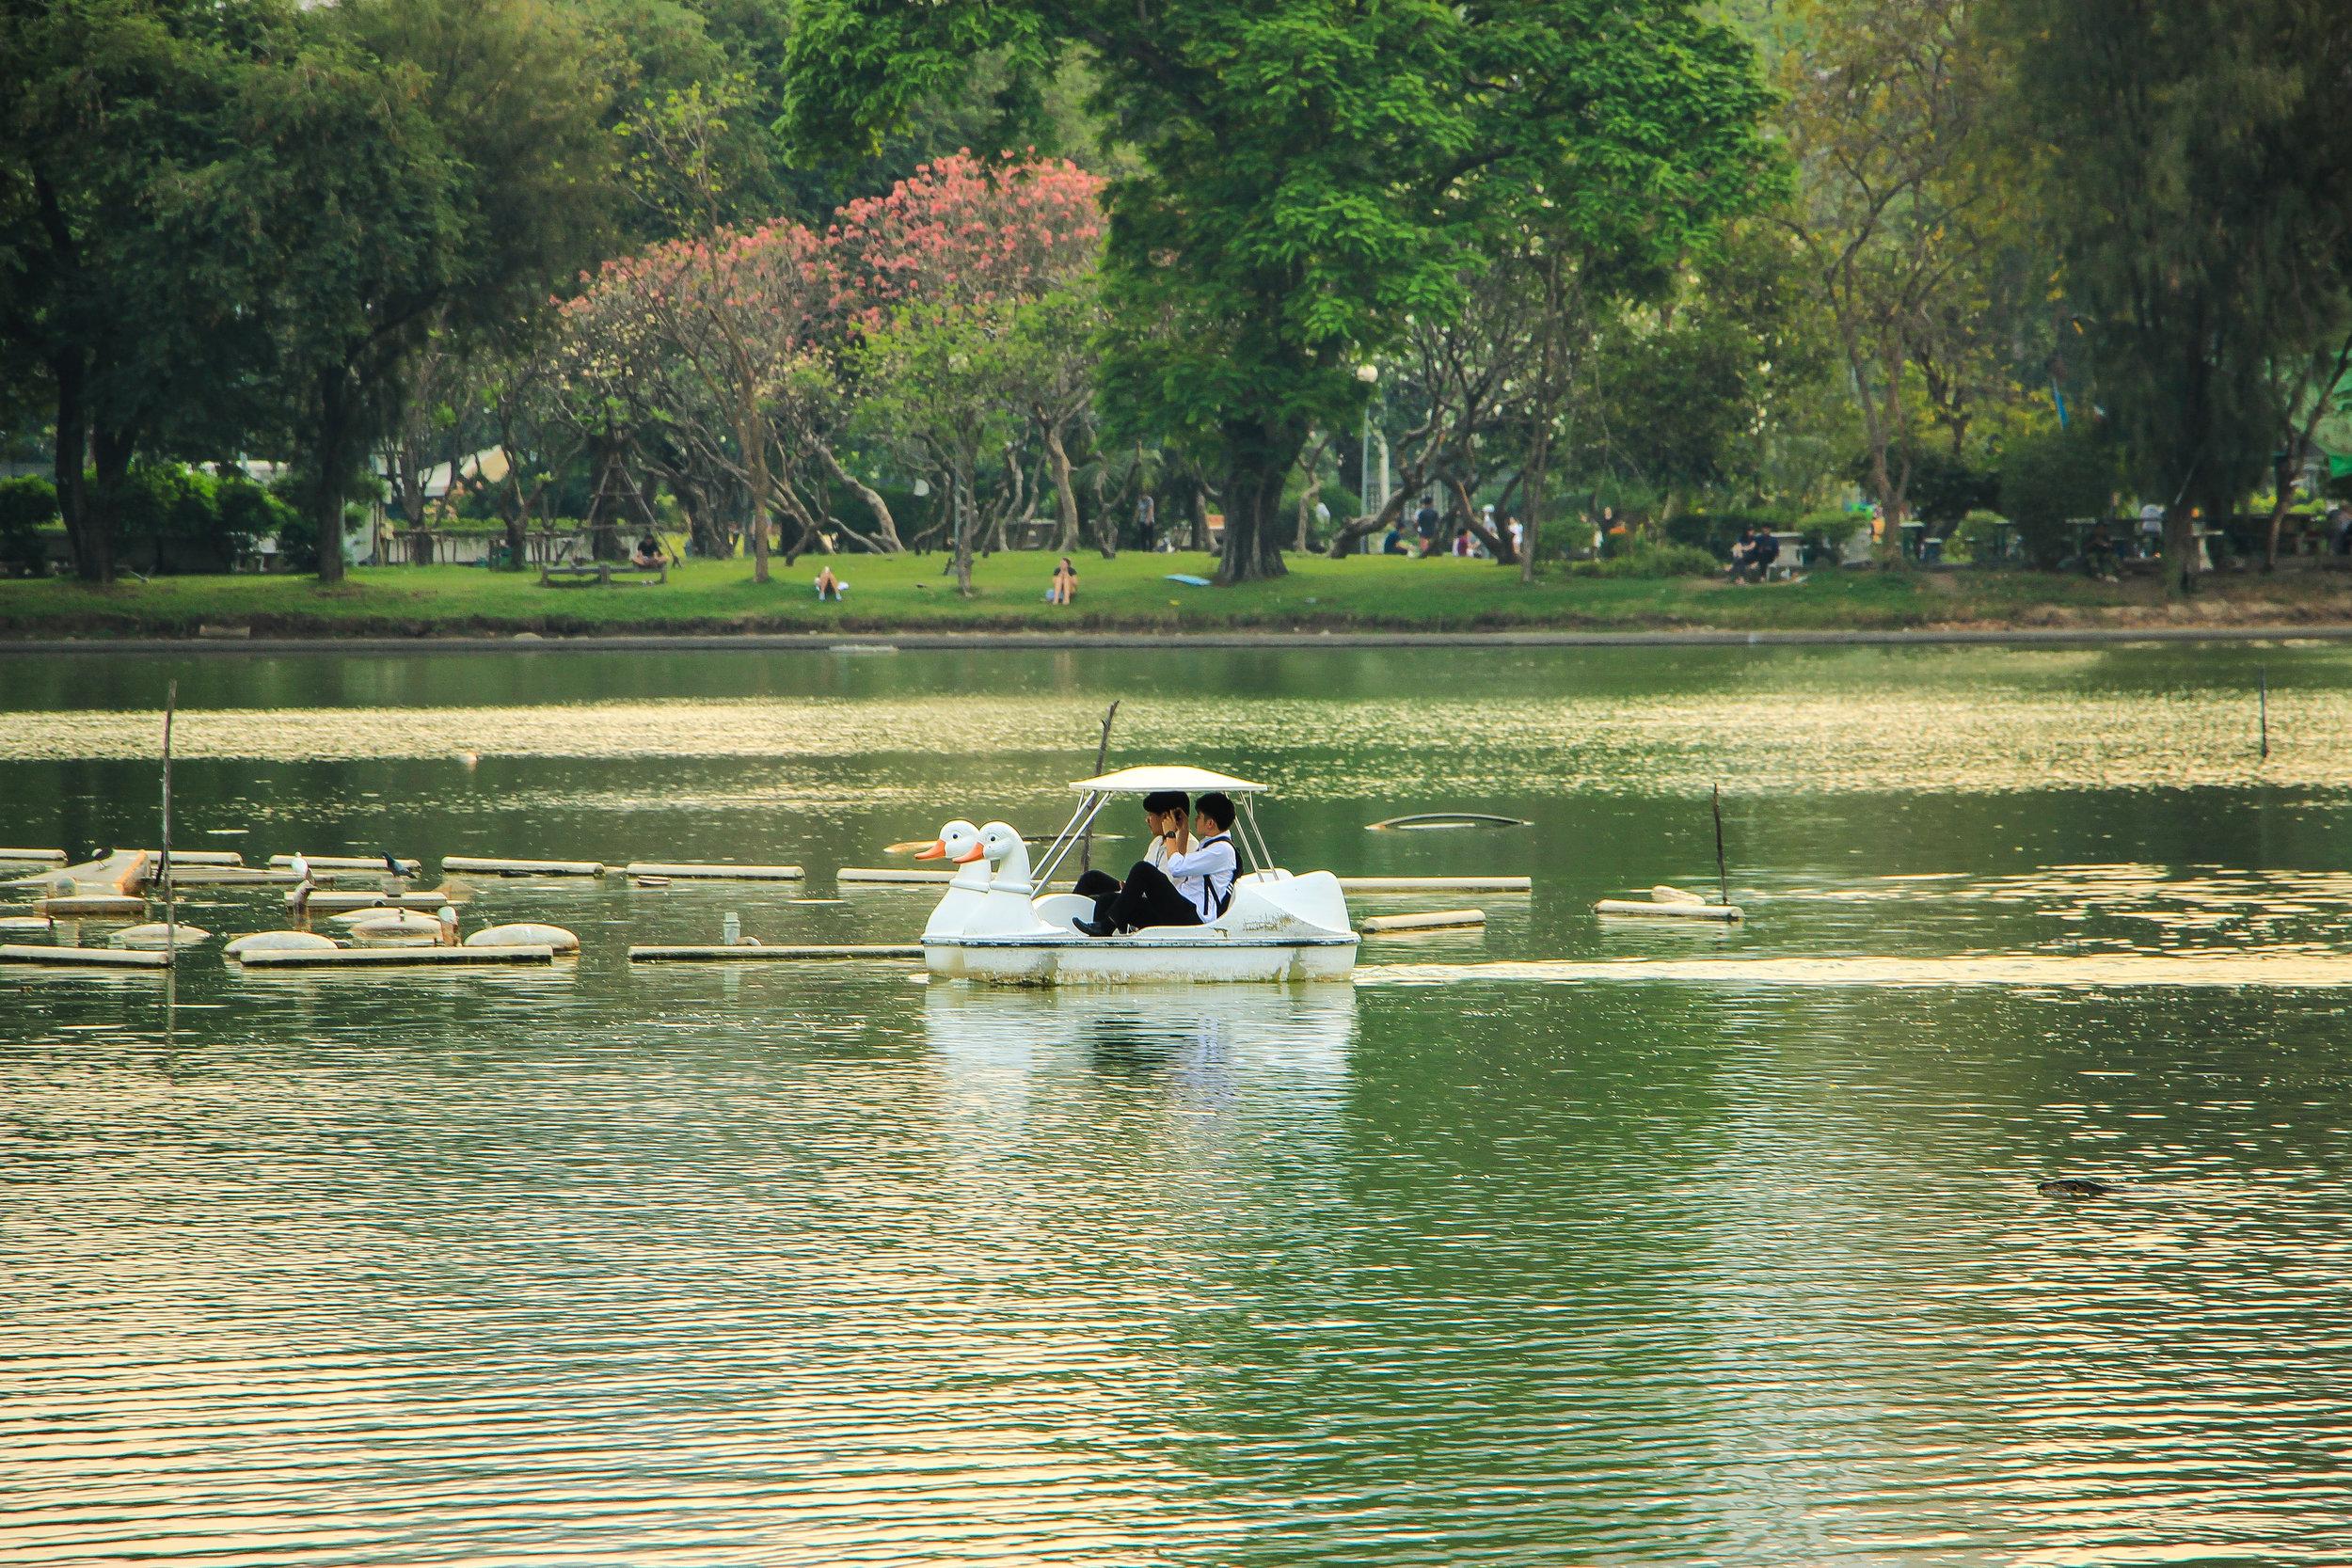 Lumpini Park, Bangkok, Thailand, Asia | DoLessGetMoreDone.com | What A Wonderful Life In A Tropical Metropolis …